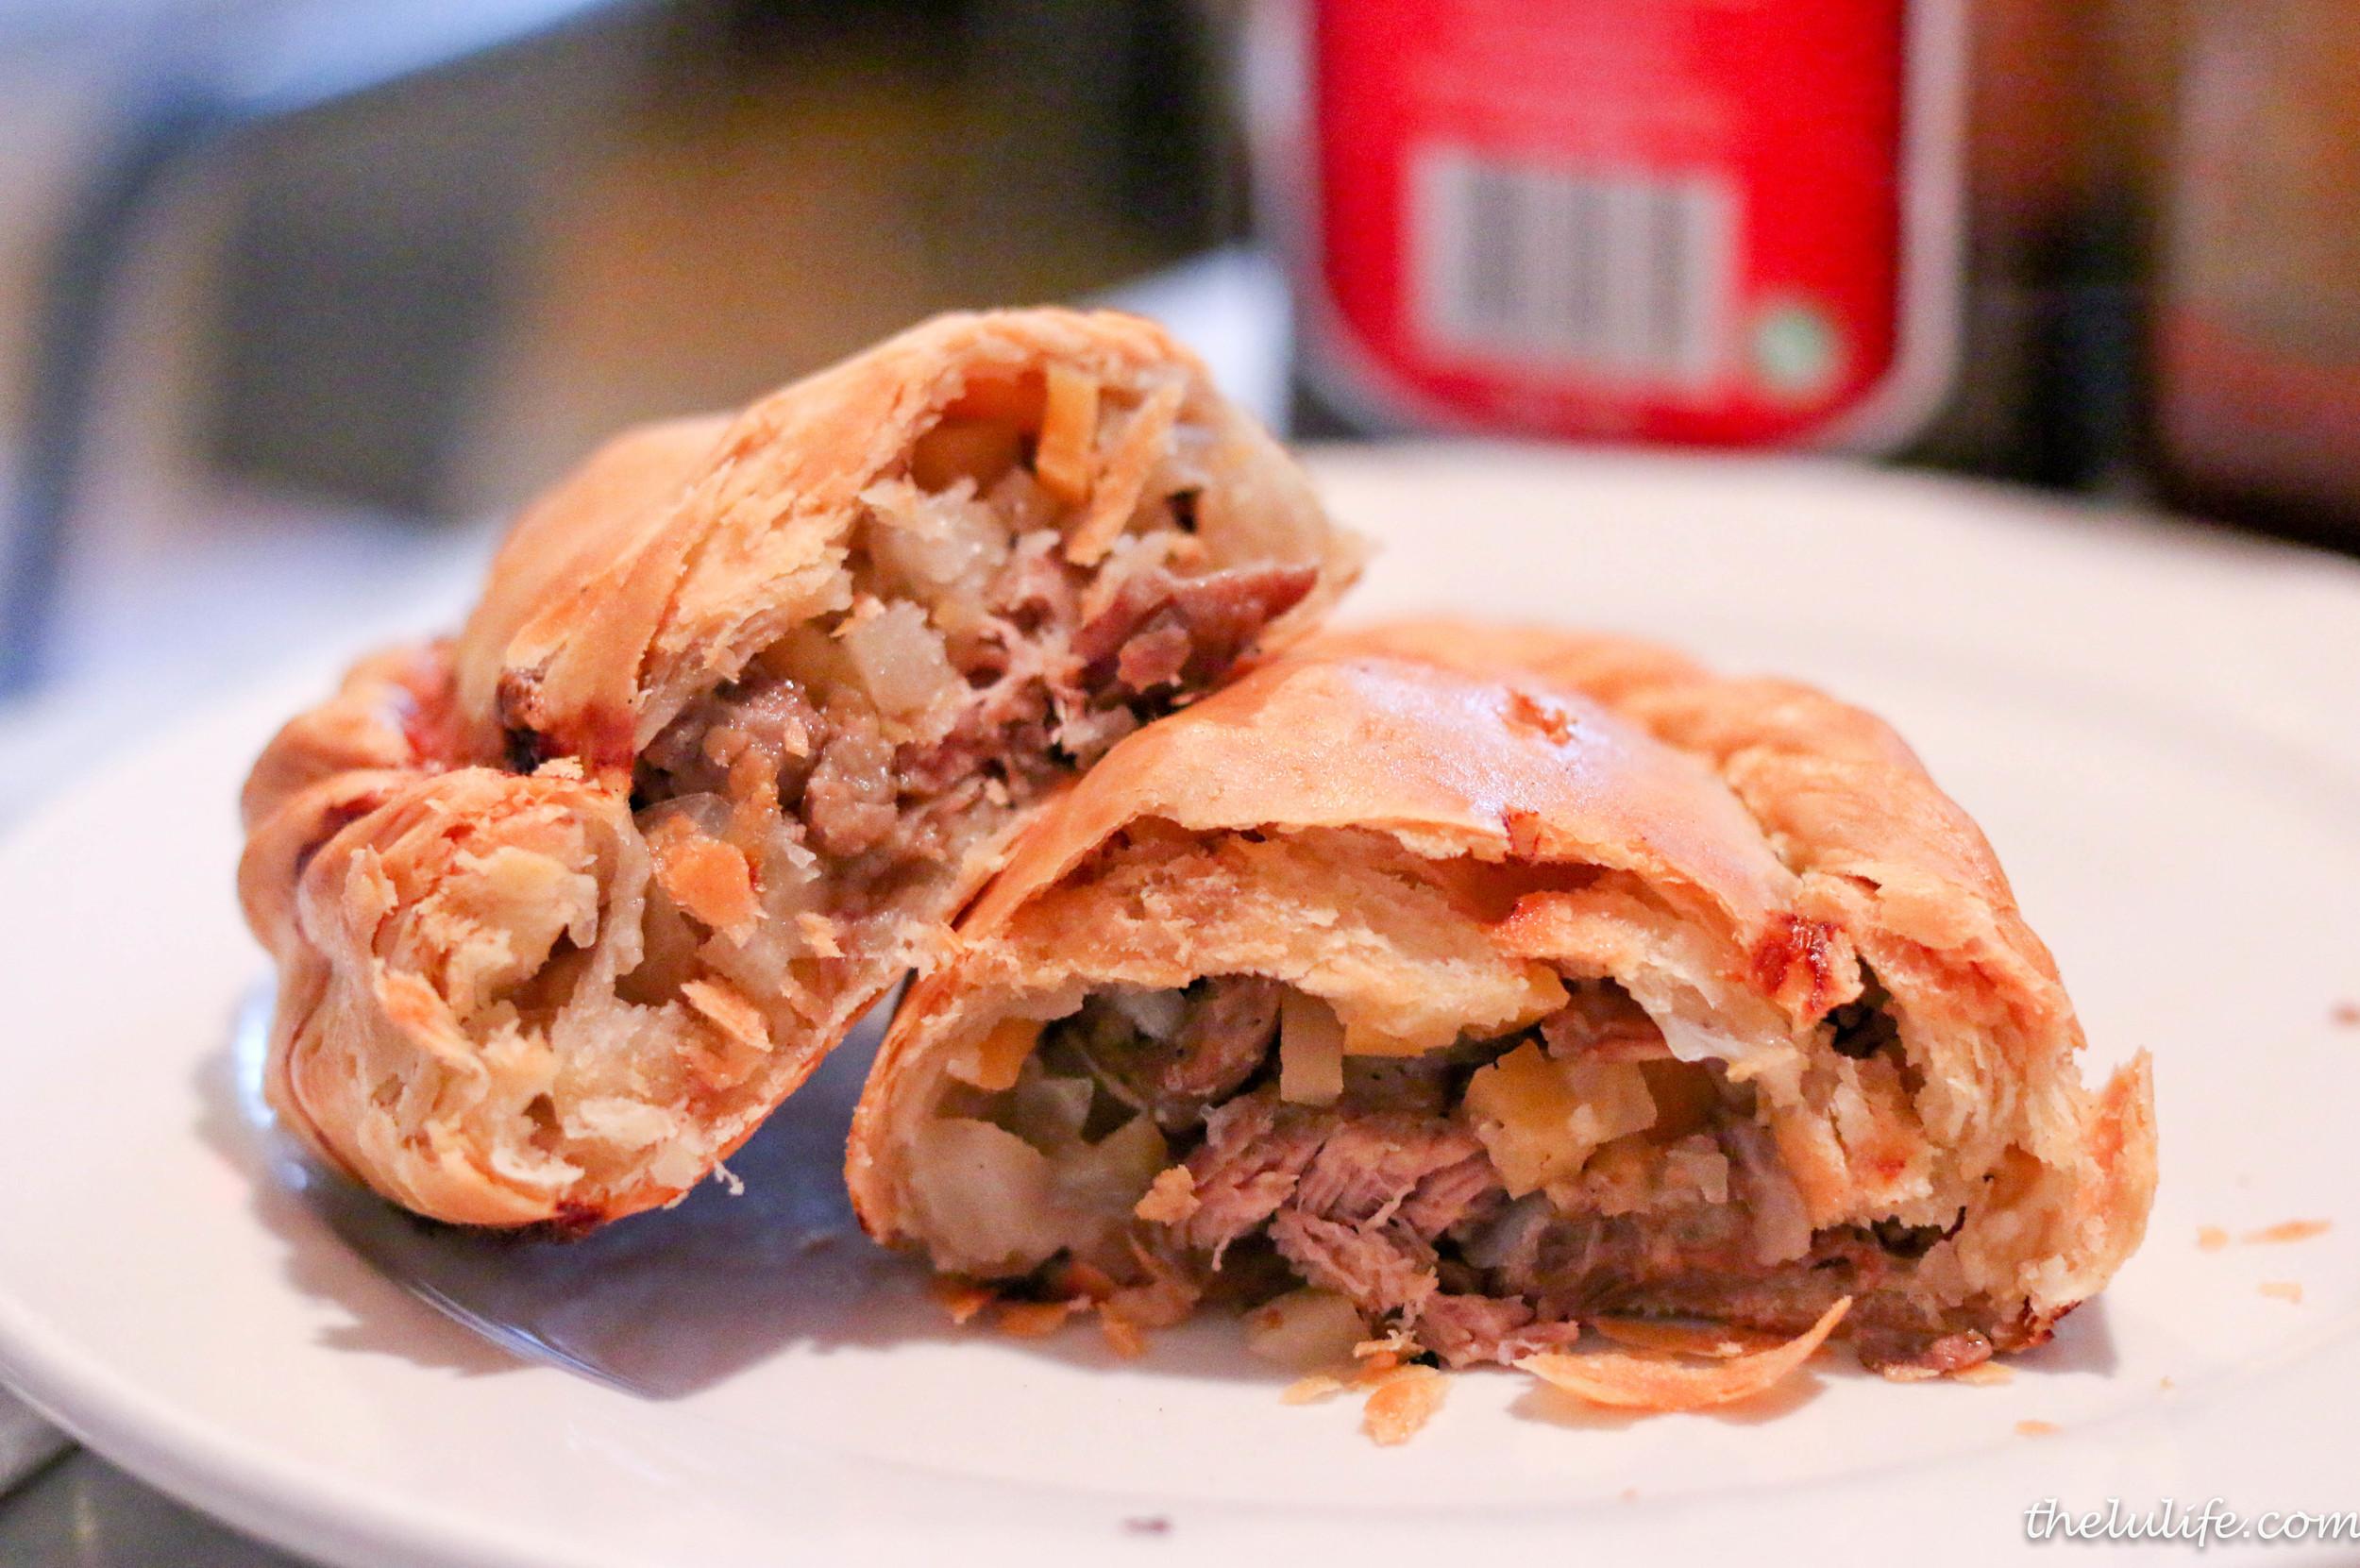 Premium steak pasty - all natural steak, potato, rutabaga, onion and spices